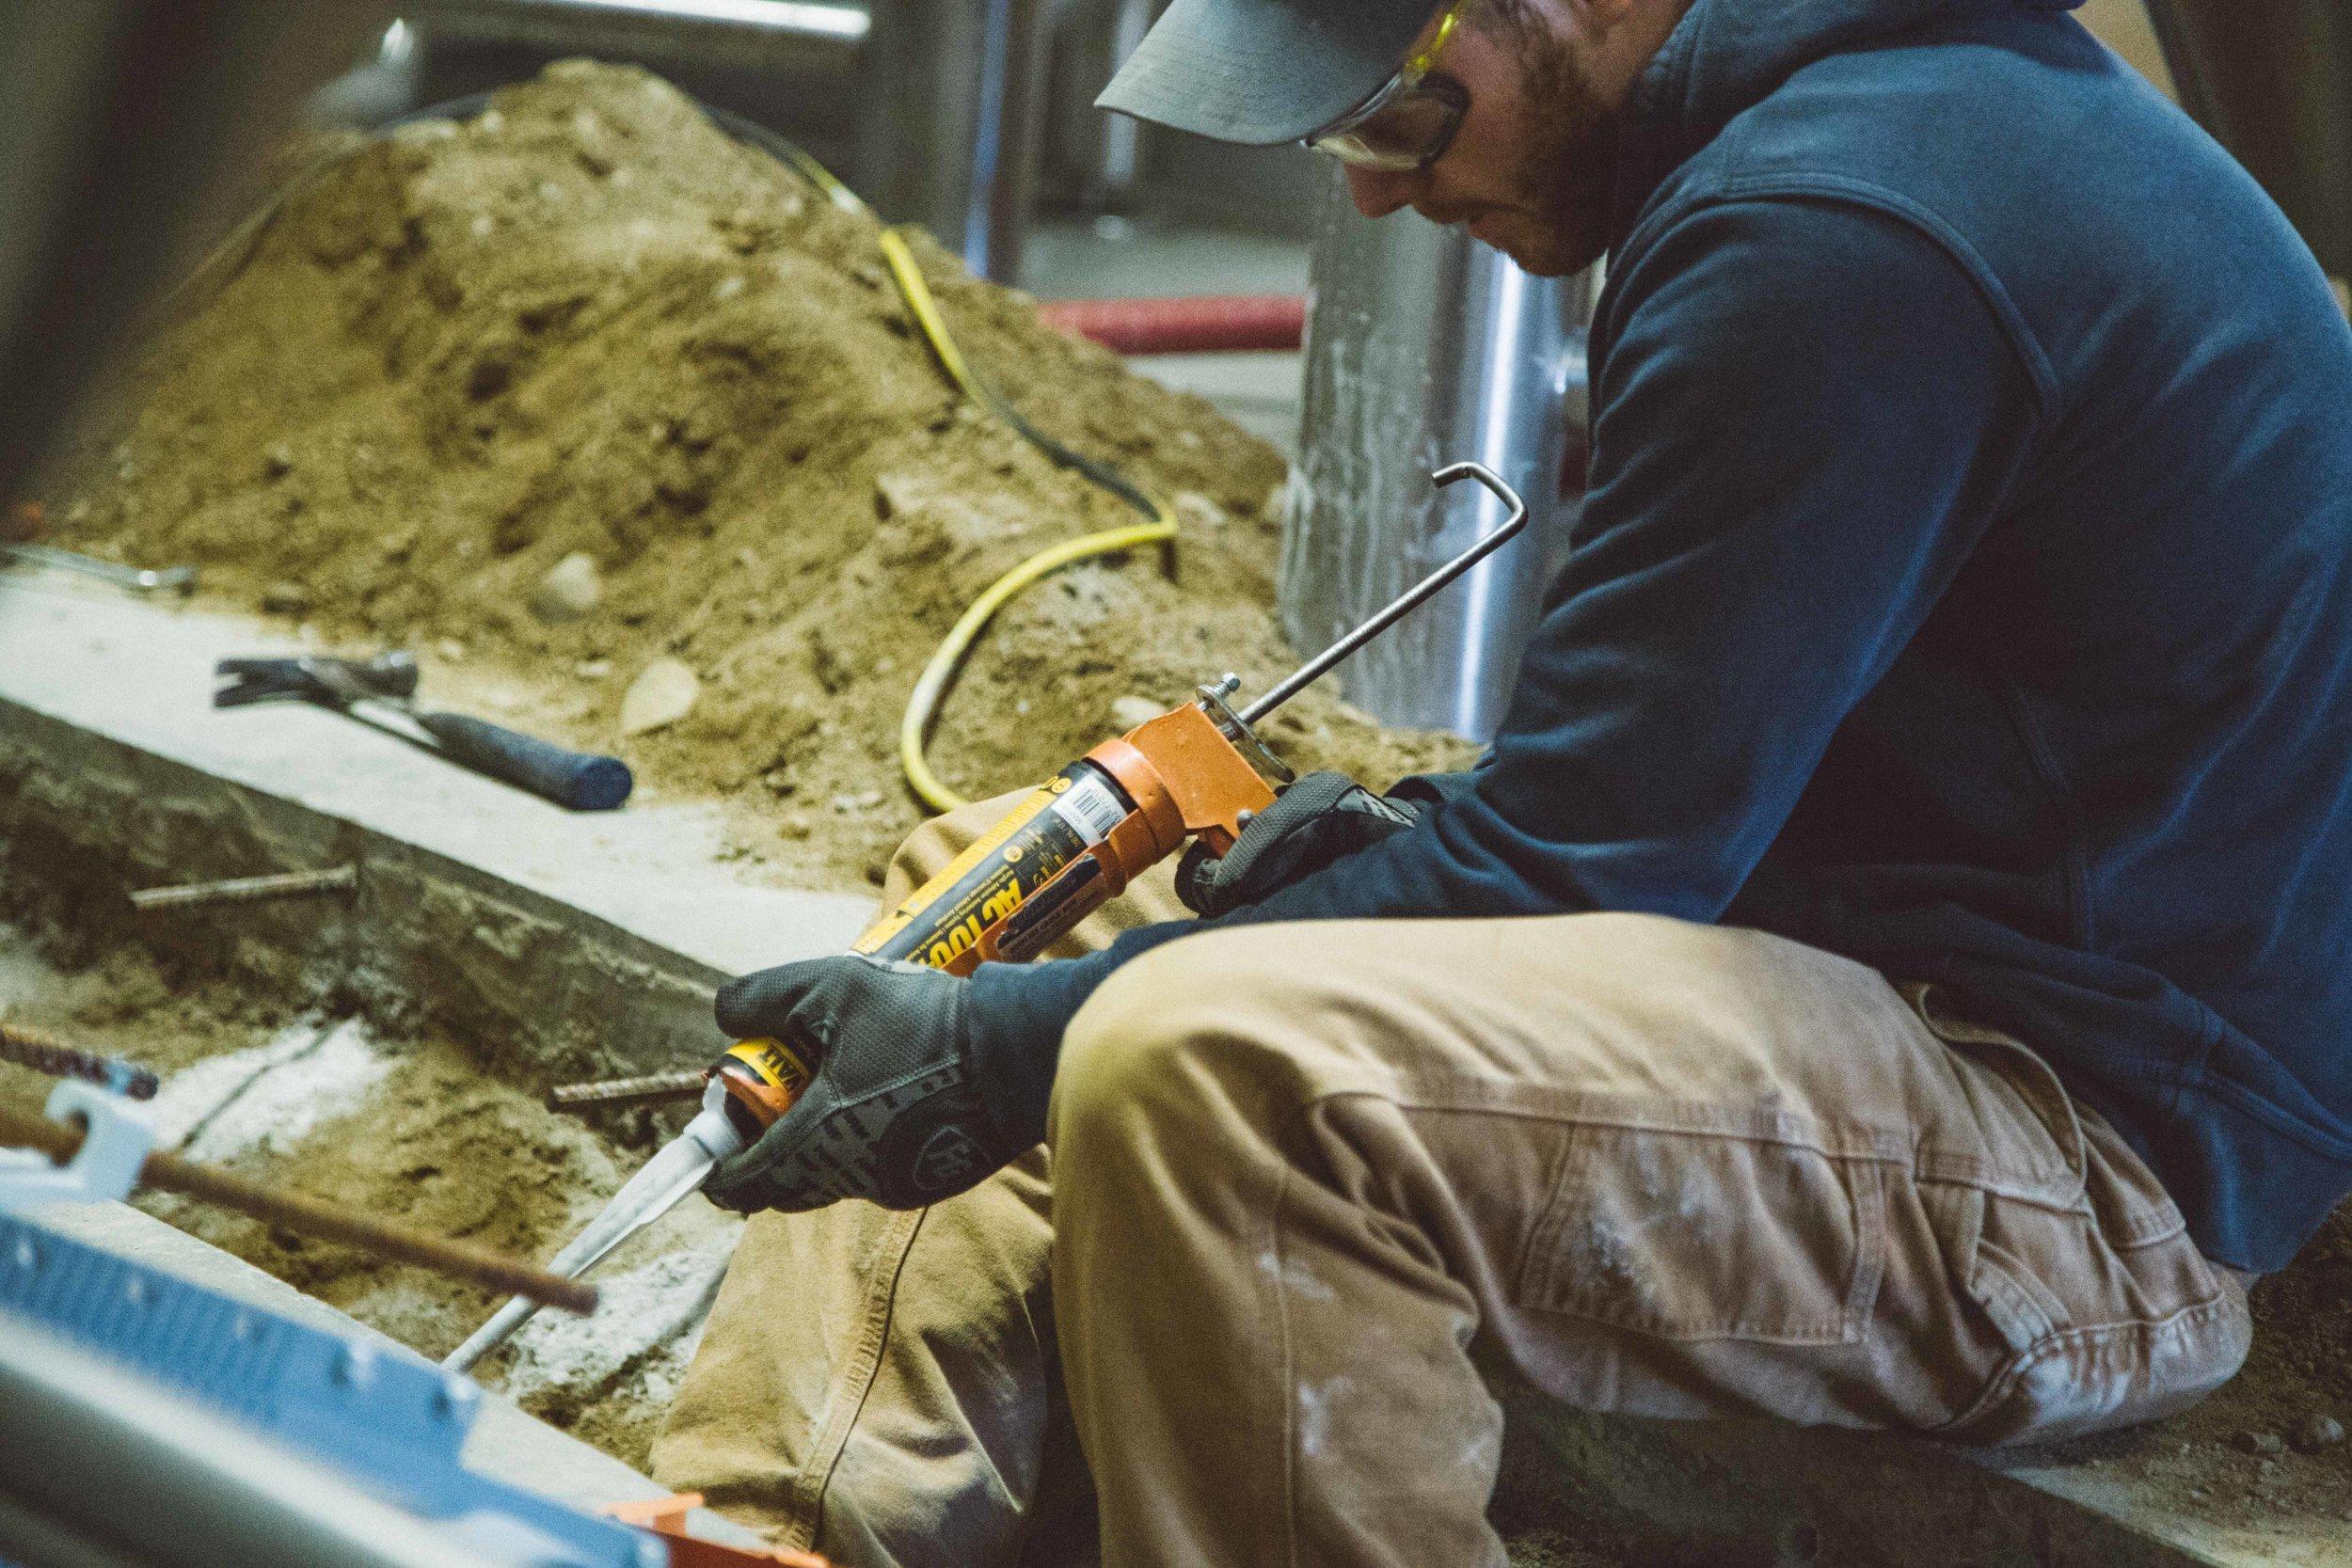 Optimum Construction Worker at Foundation brewery.jpg